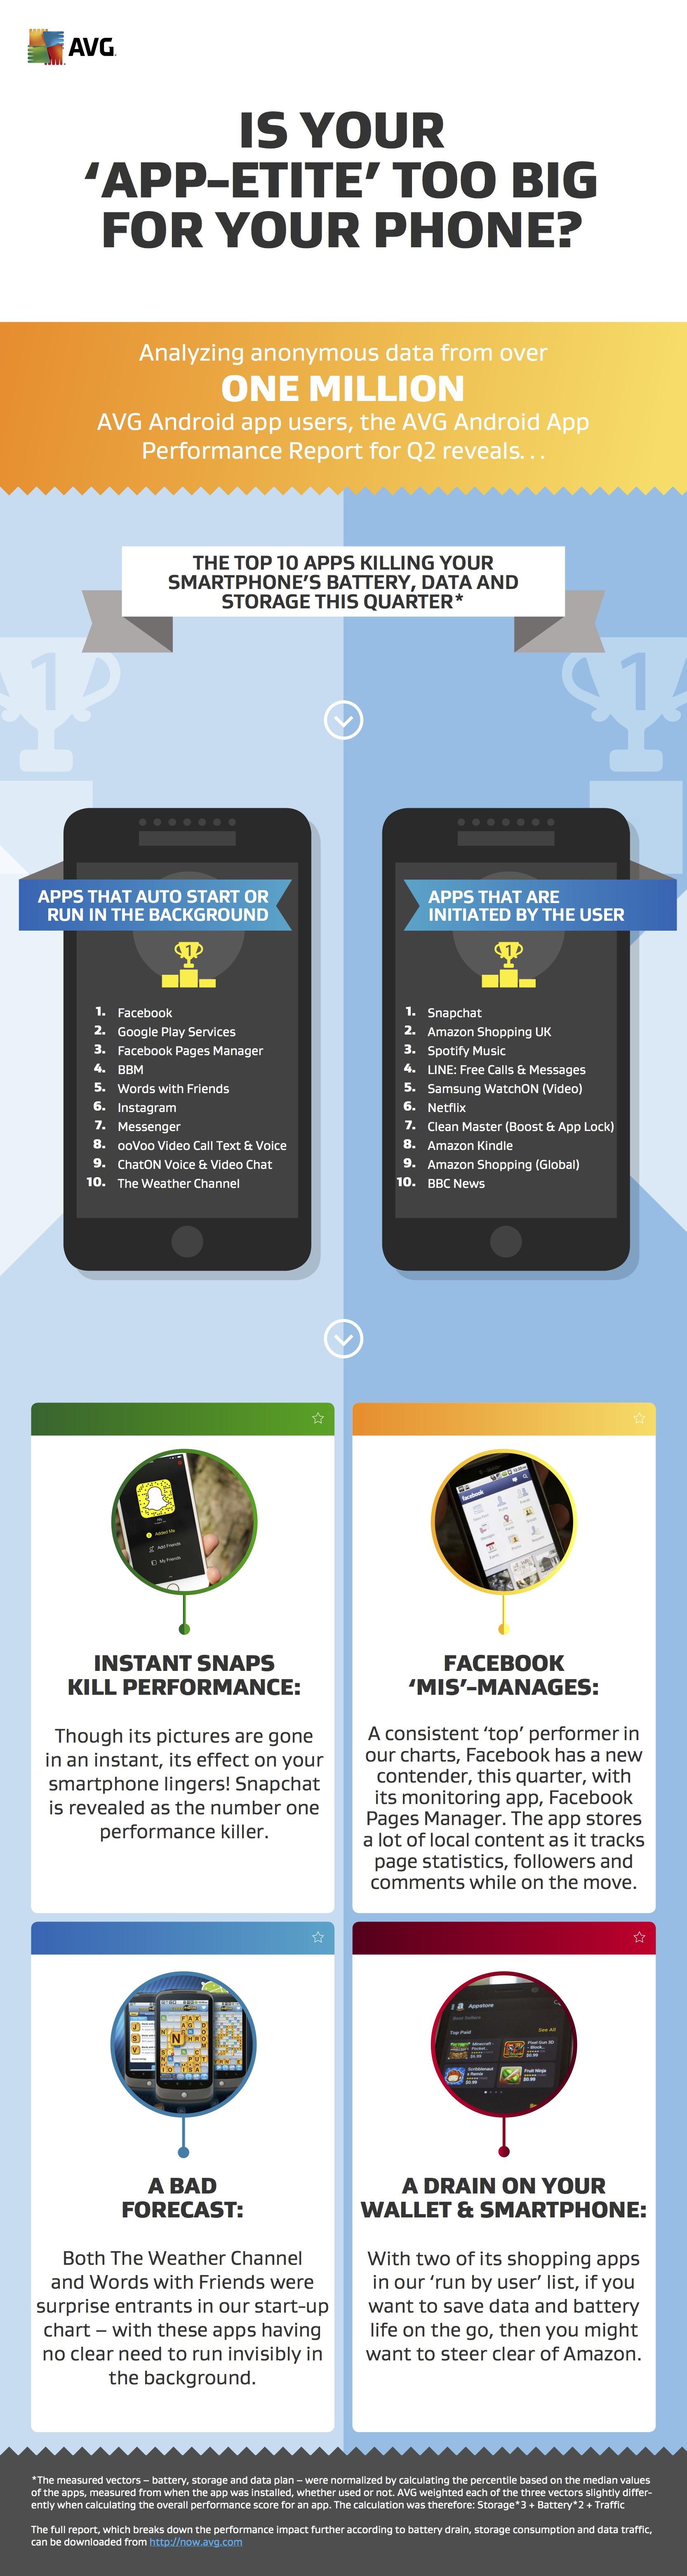 AVG App Reprort Infographic Q2 2015